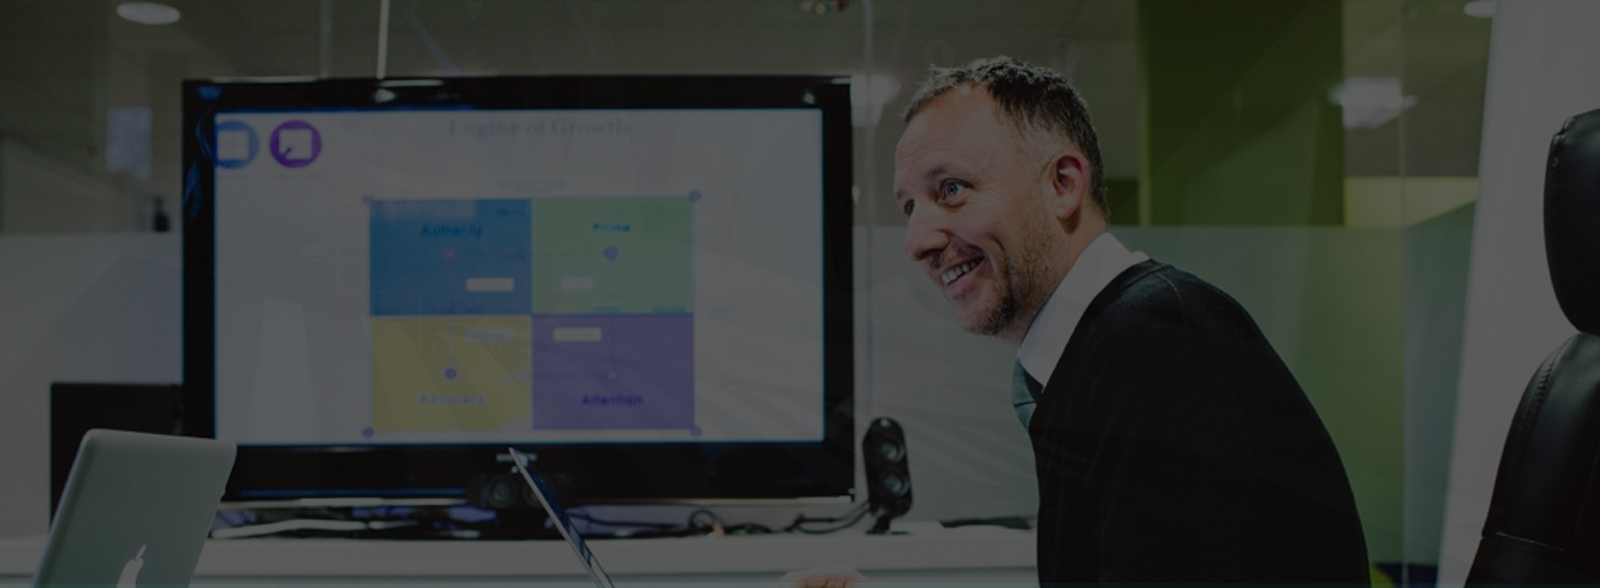 niall mckeown digital transformation course